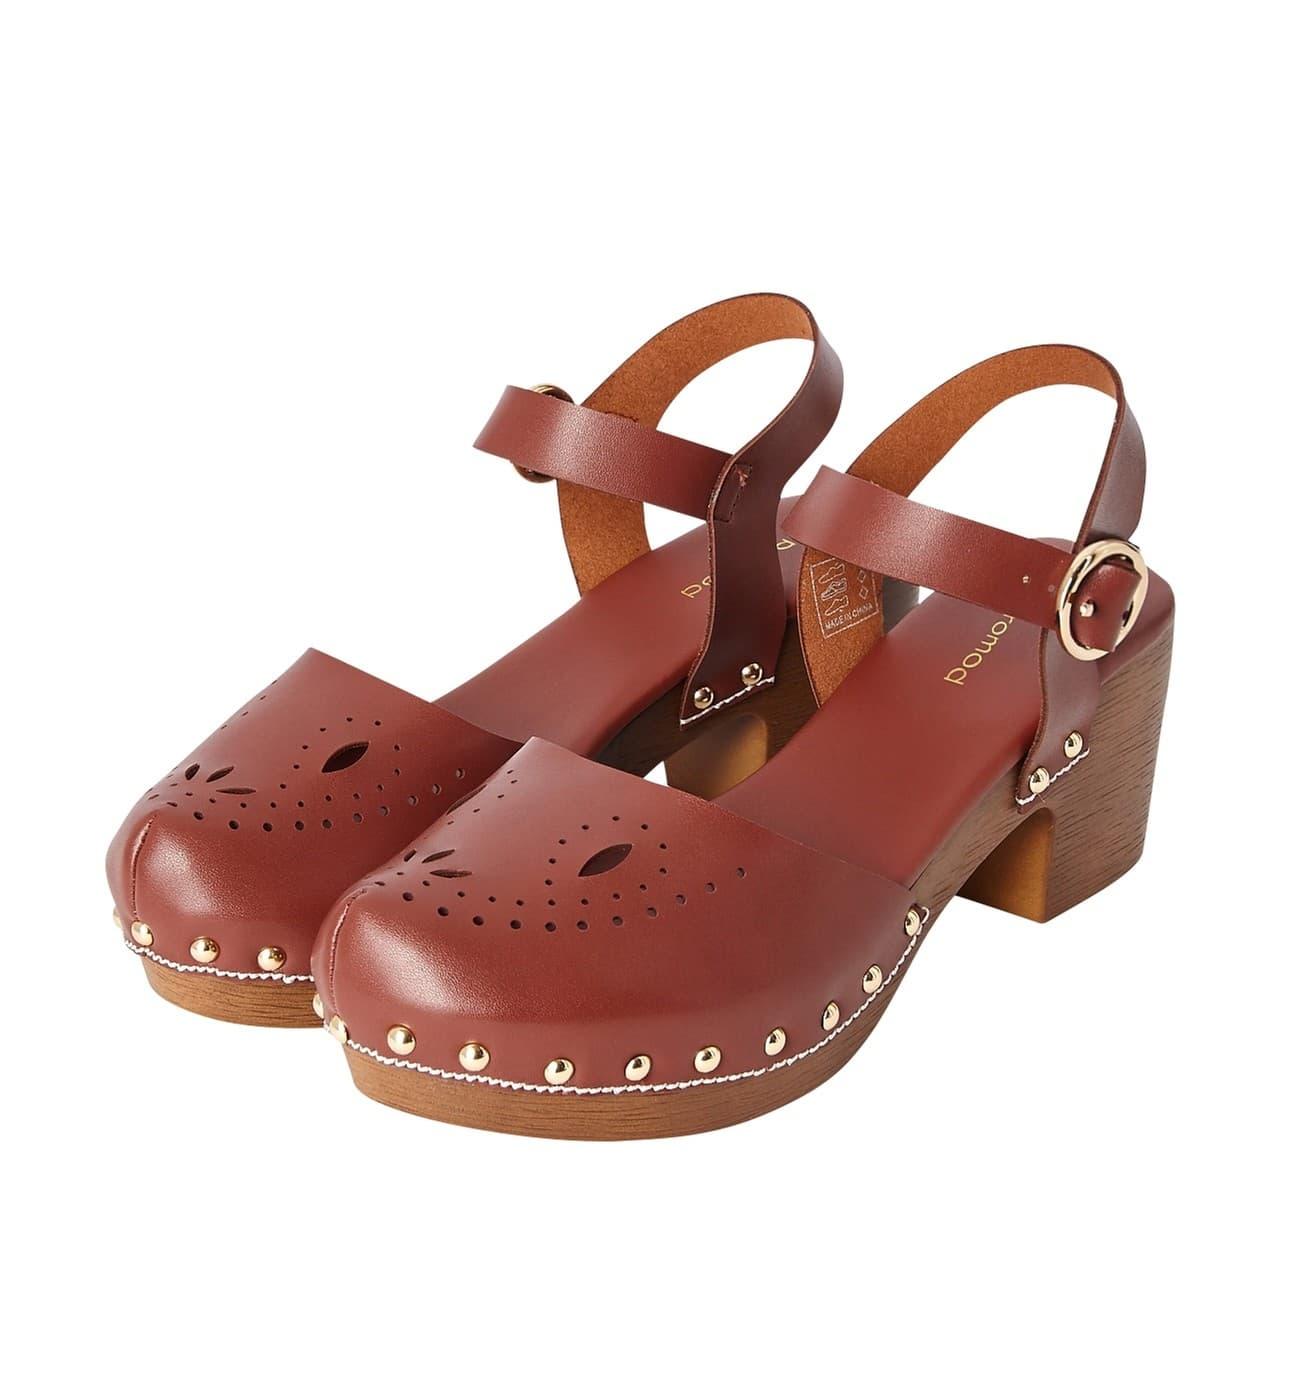 Sandales sabot effet cuir perforé, Promod, 39,95€.